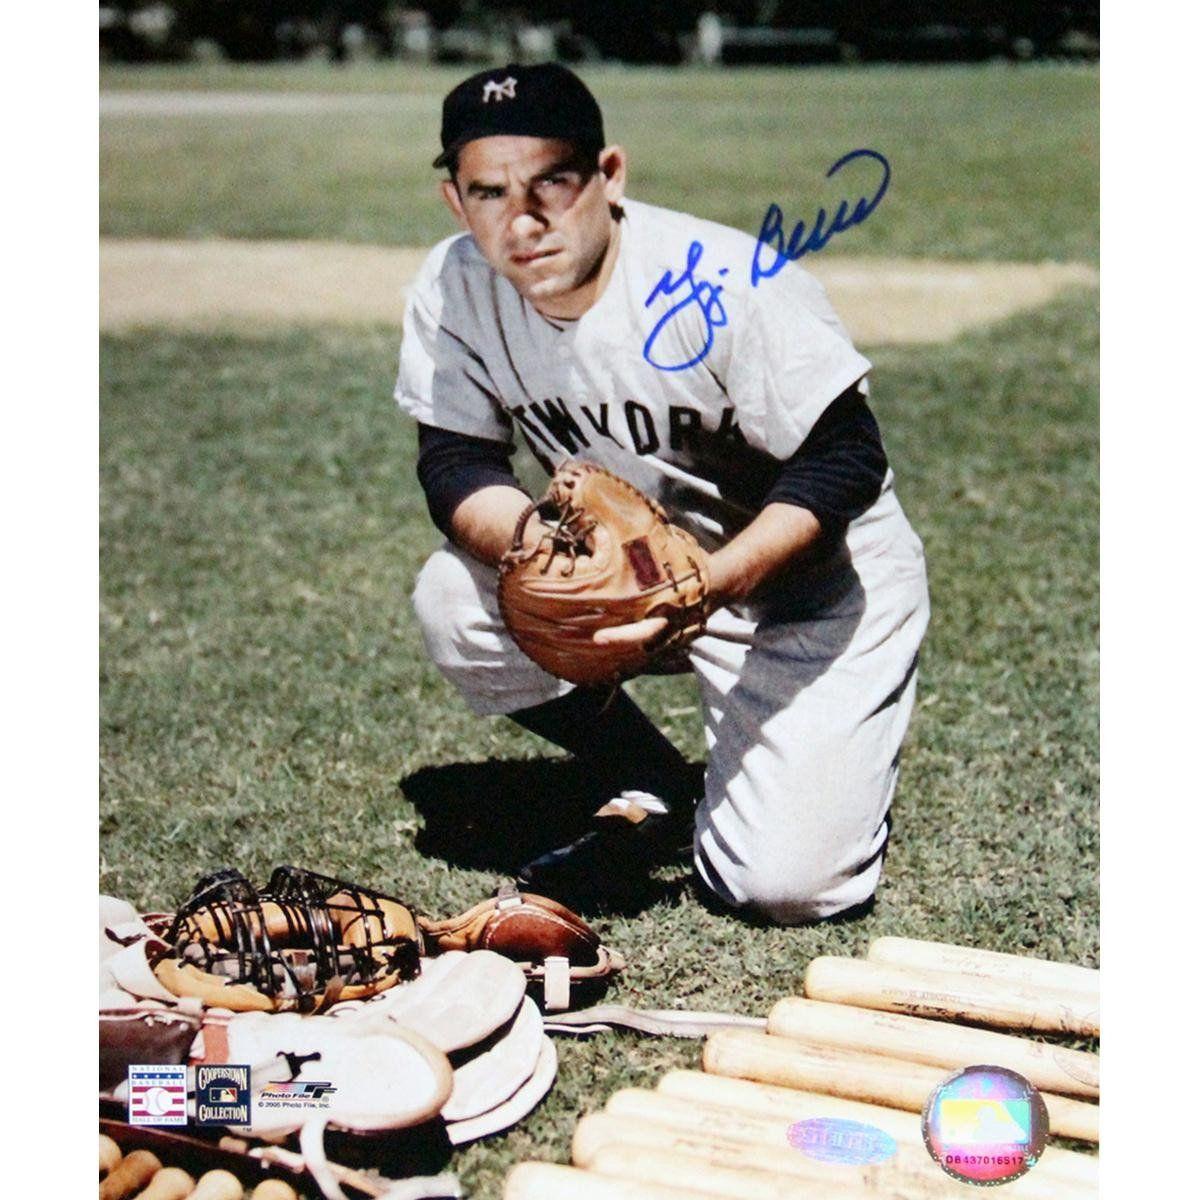 Yogi Berra Signed Kneeling By Equipment Color Vertical 8x10 Photo New York Yankees Yogi Berra Go Yankees